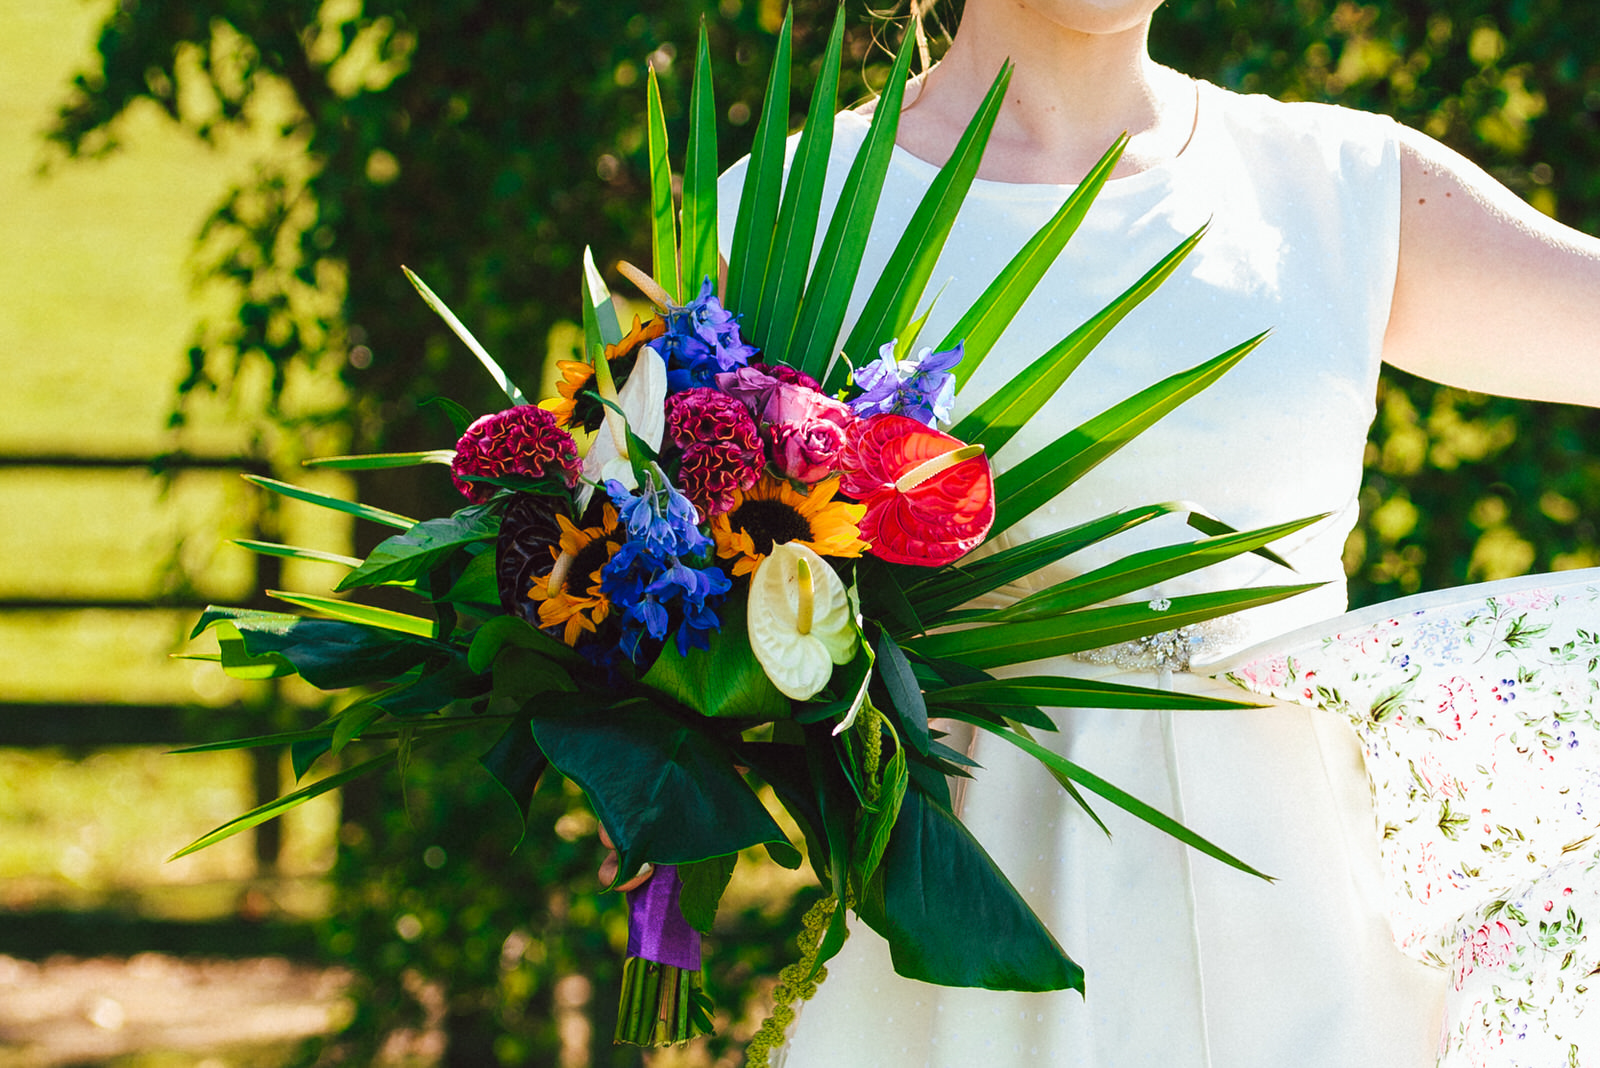 garden-weedon-tropical-bouquet-1